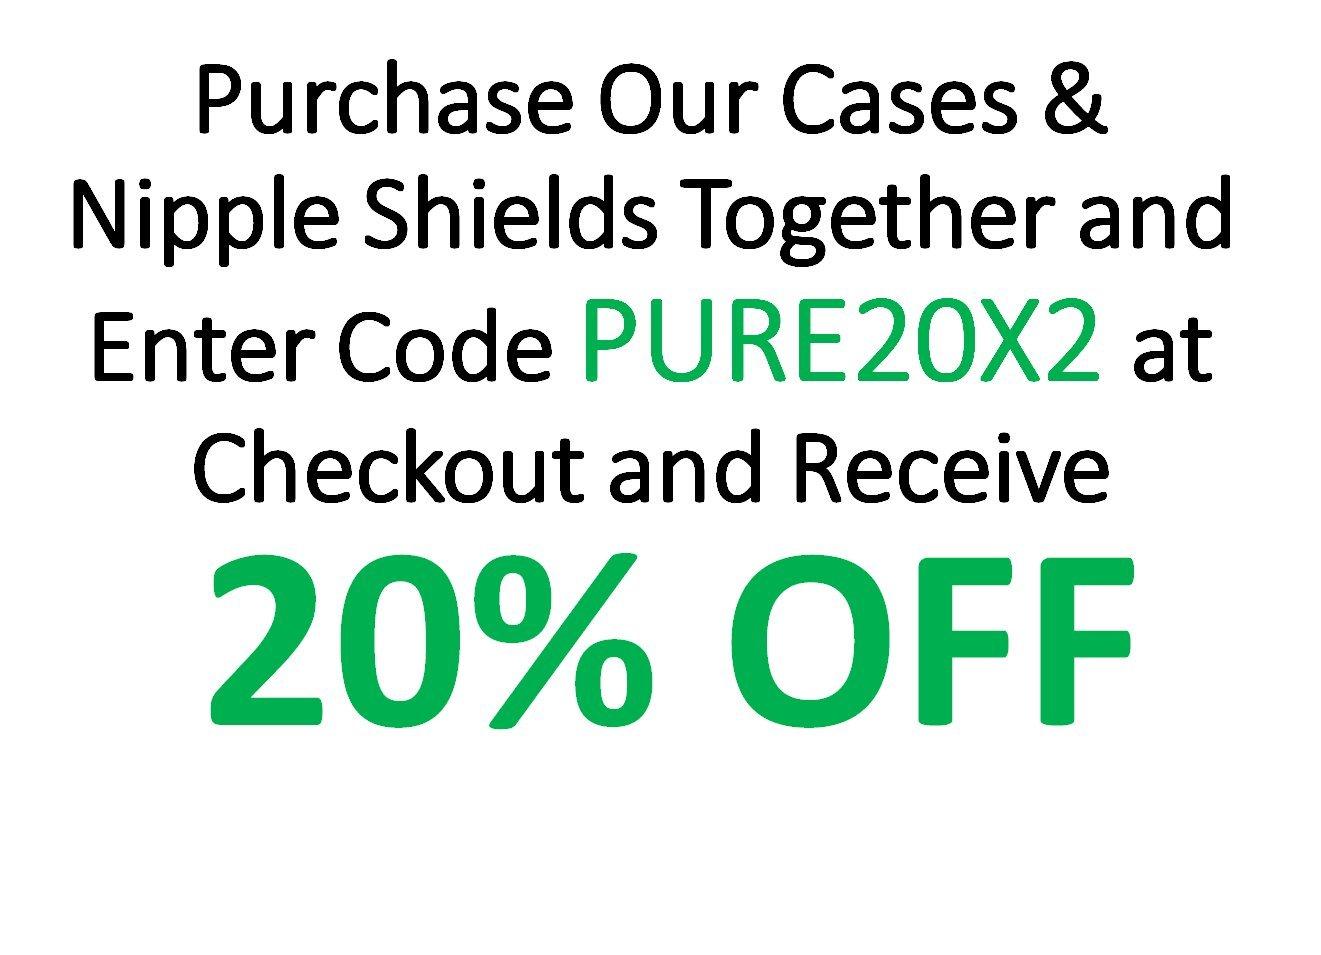 BPA and BPS Free Non-Toxic Set of 3 with Soft Cotton Reusable Drawstring Bag purifyou Premium Nipple Shield